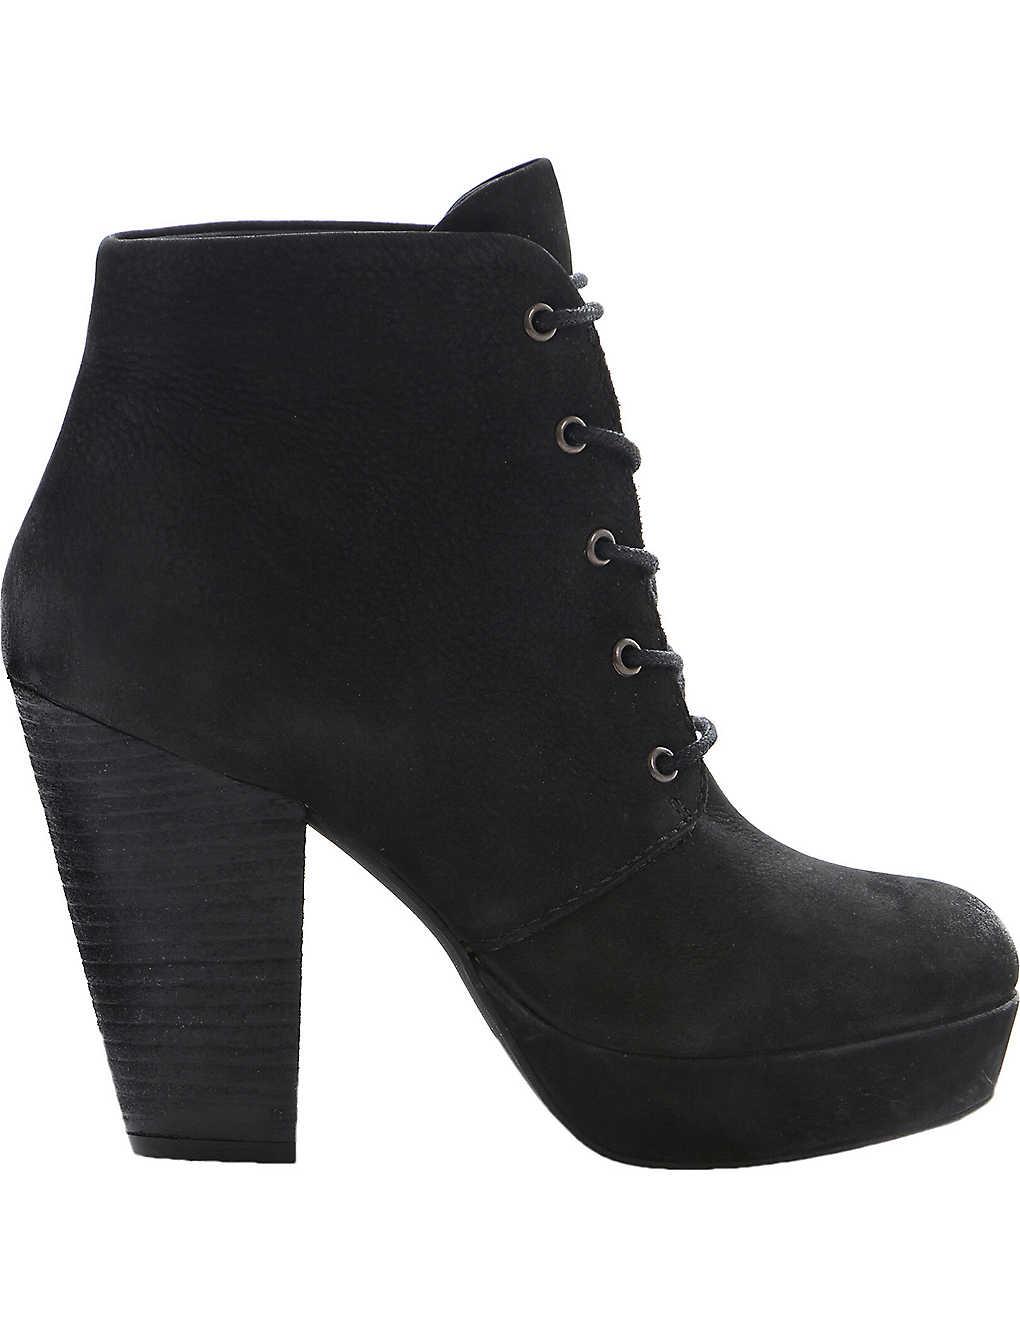 9be23f38c94 STEVE MADDEN - Raspy leather lace-up boots | Selfridges.com